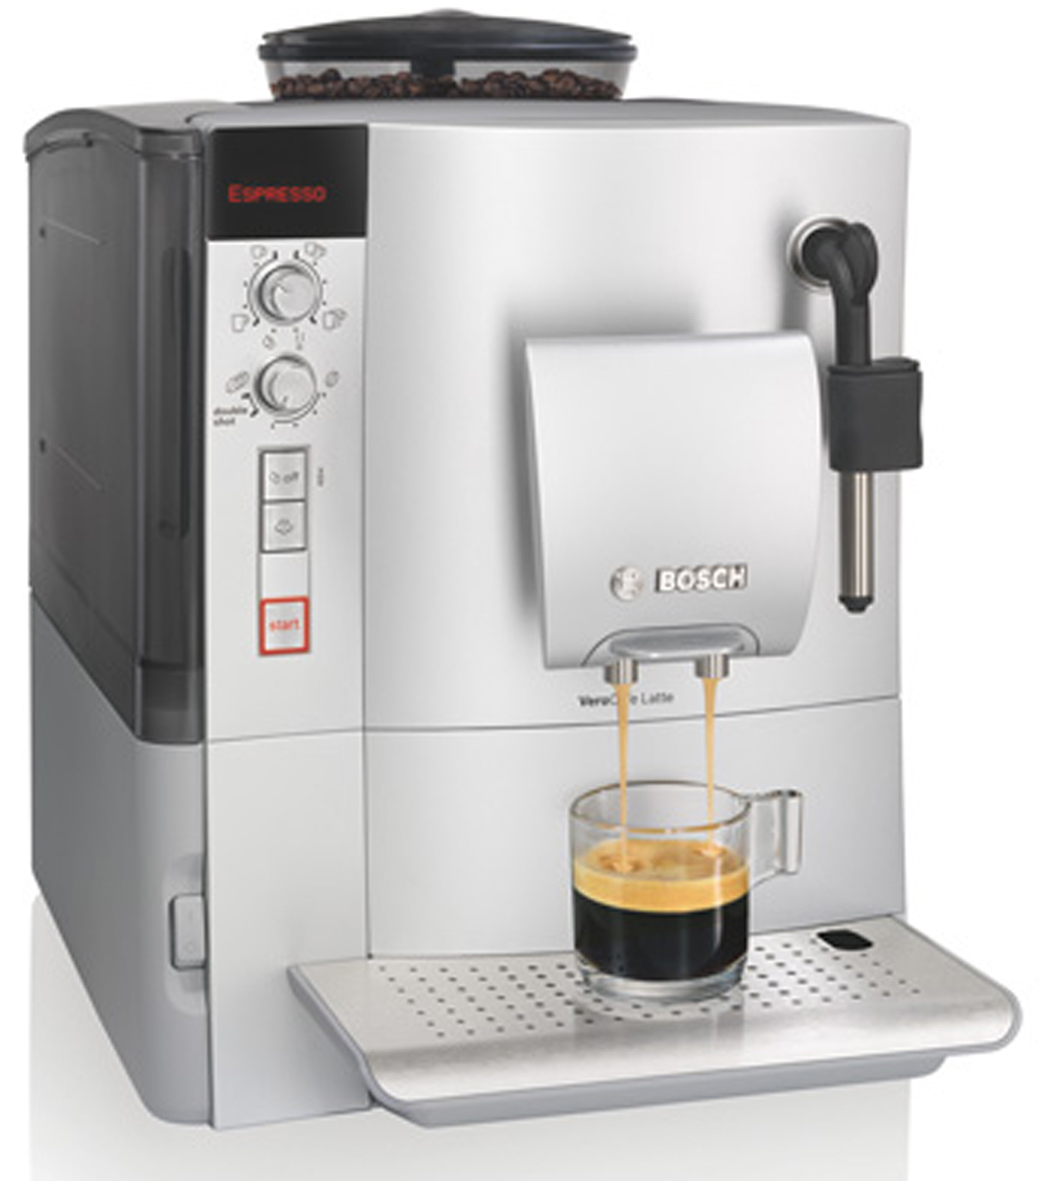 kaffeevollautomat bosch verocafe latte und lattepro. Black Bedroom Furniture Sets. Home Design Ideas